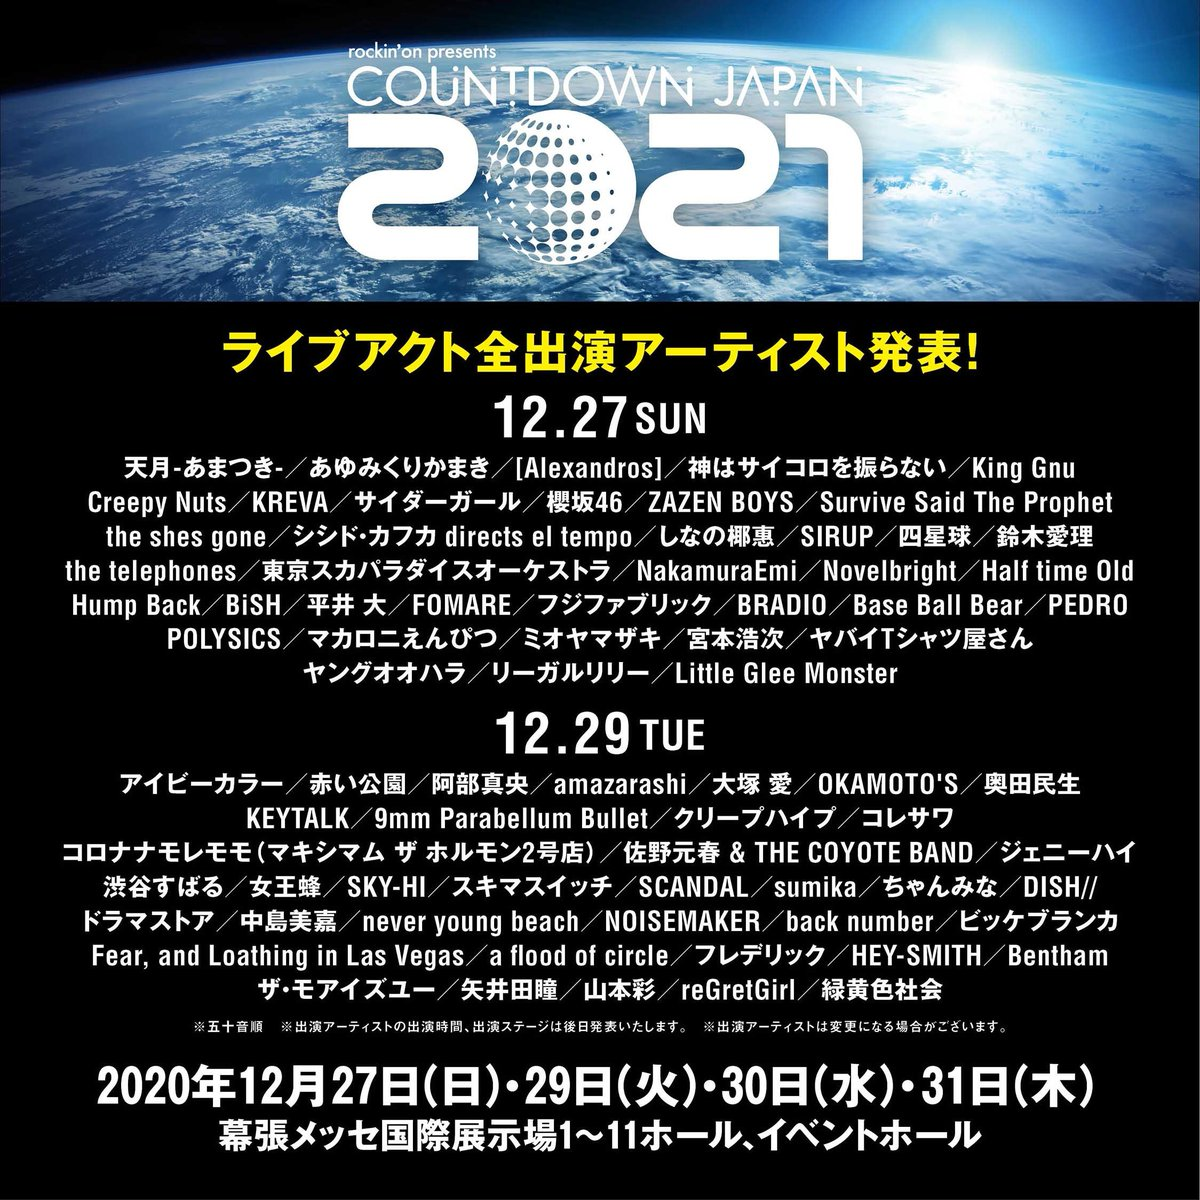 CDJ20/21は12/27(日)・29(火)・30(水)・31(木)の4日間、幕張メッセ国際展示場1~11ホール、イベントホールで開催